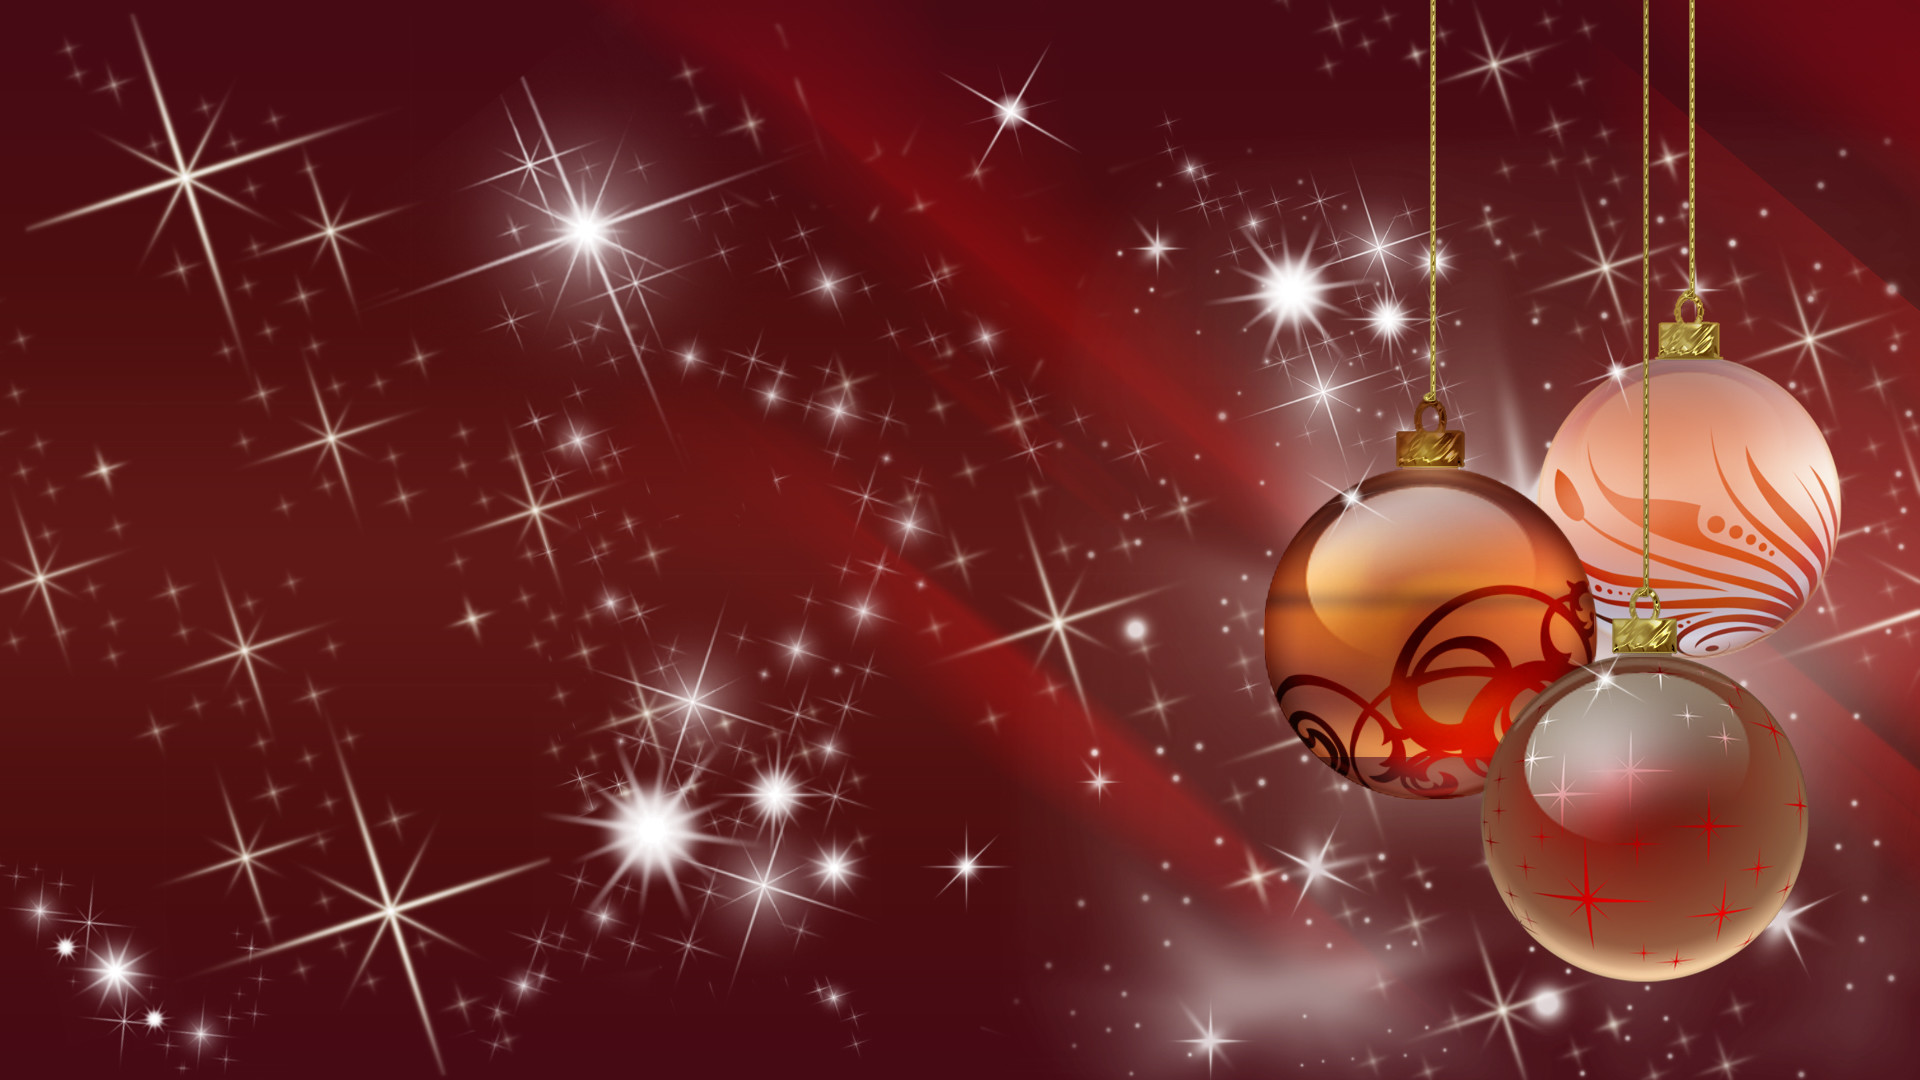 1920x1080 Animated Christmas Desktop Backgrounds, wallpaper, Animated .